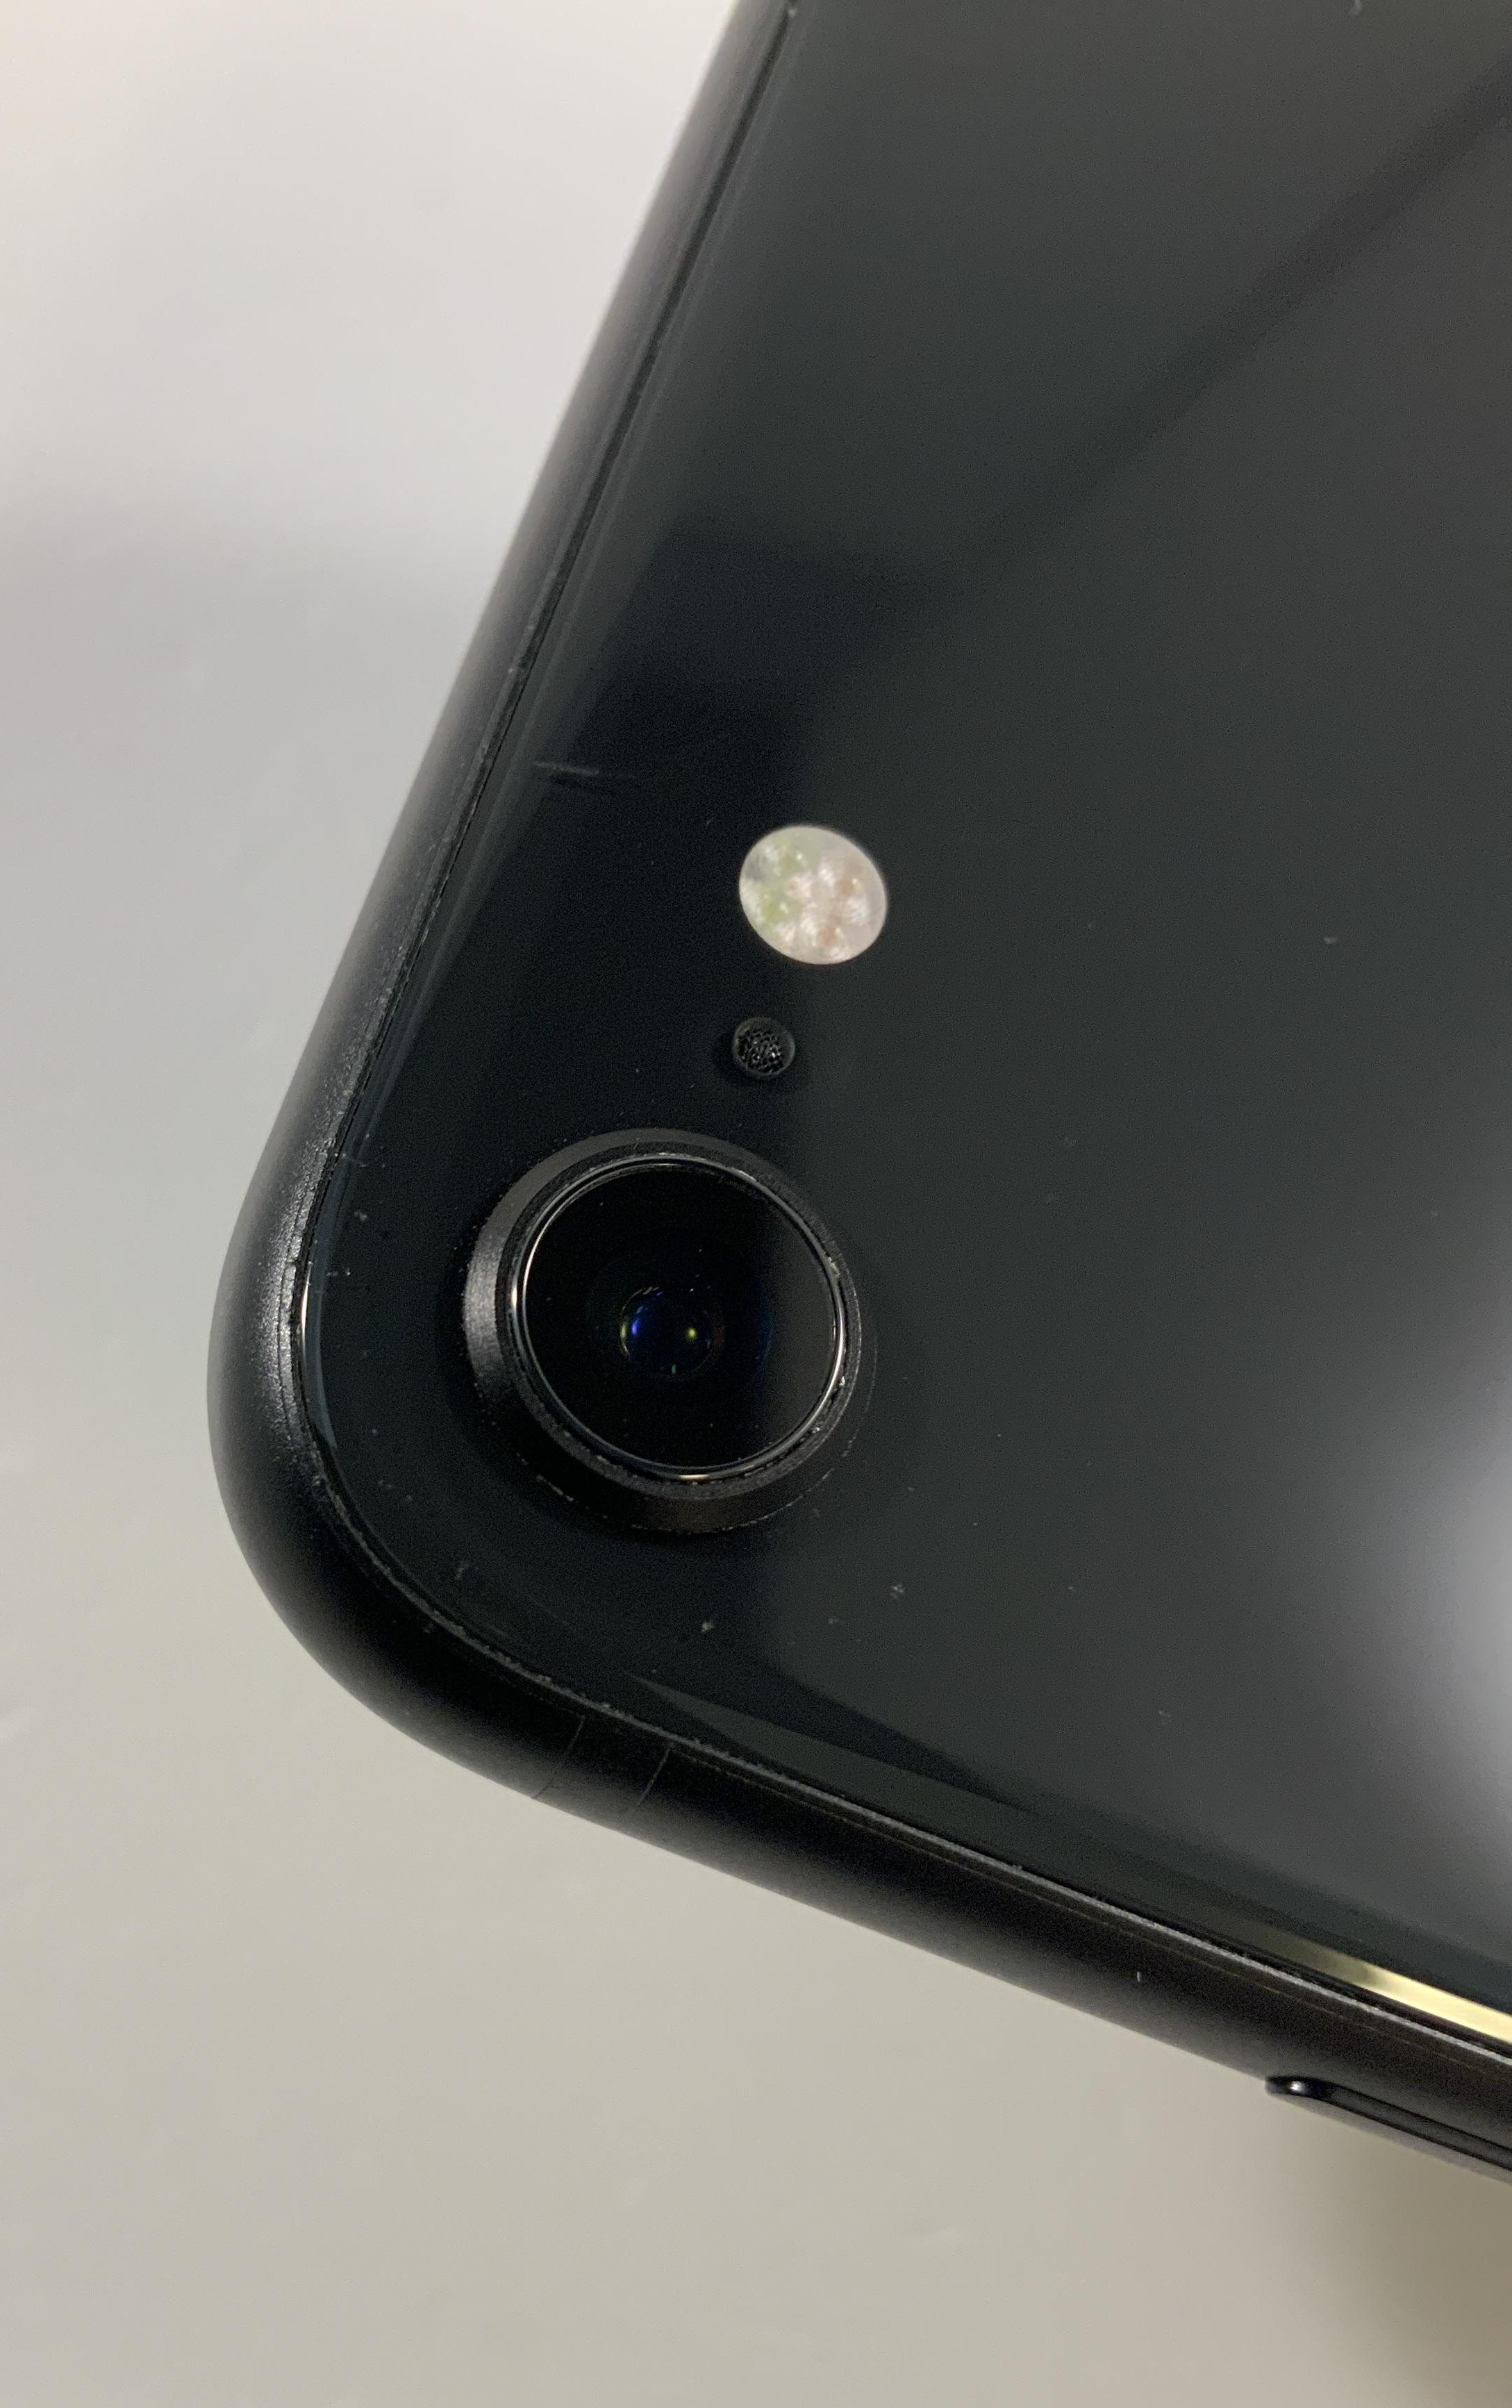 iPhone SE (2nd Gen) 128GB, 128GB, Black, imagen 3